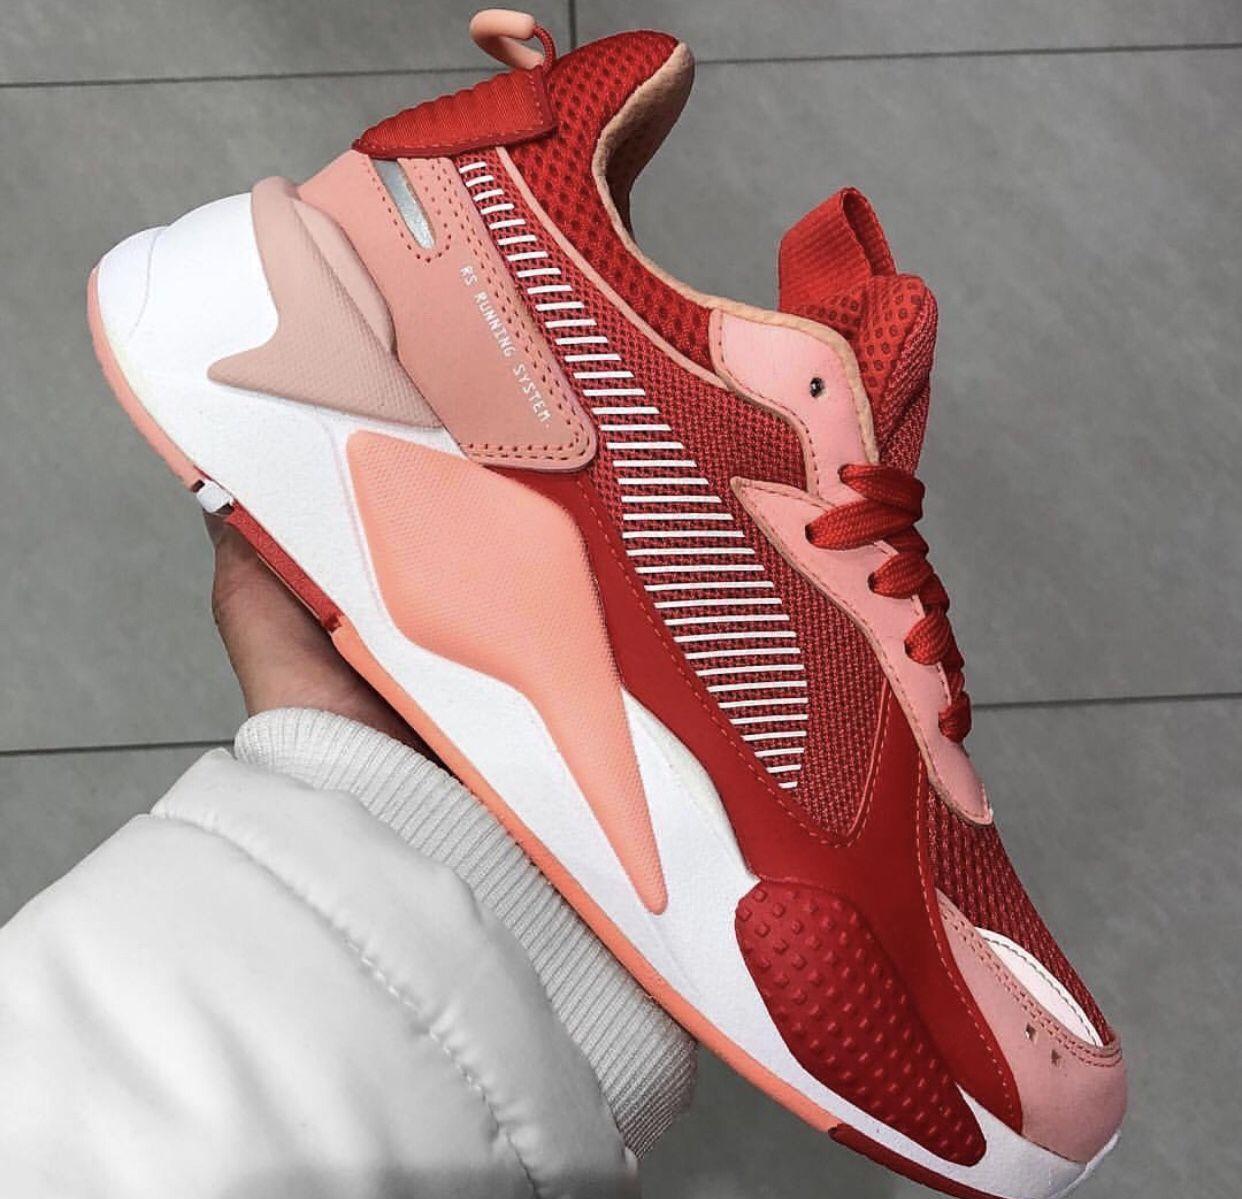 3979c6a6f2e #puma #rs-x #womensshoes #shoesforwomen #womensfashion #sneakers #hypebeast